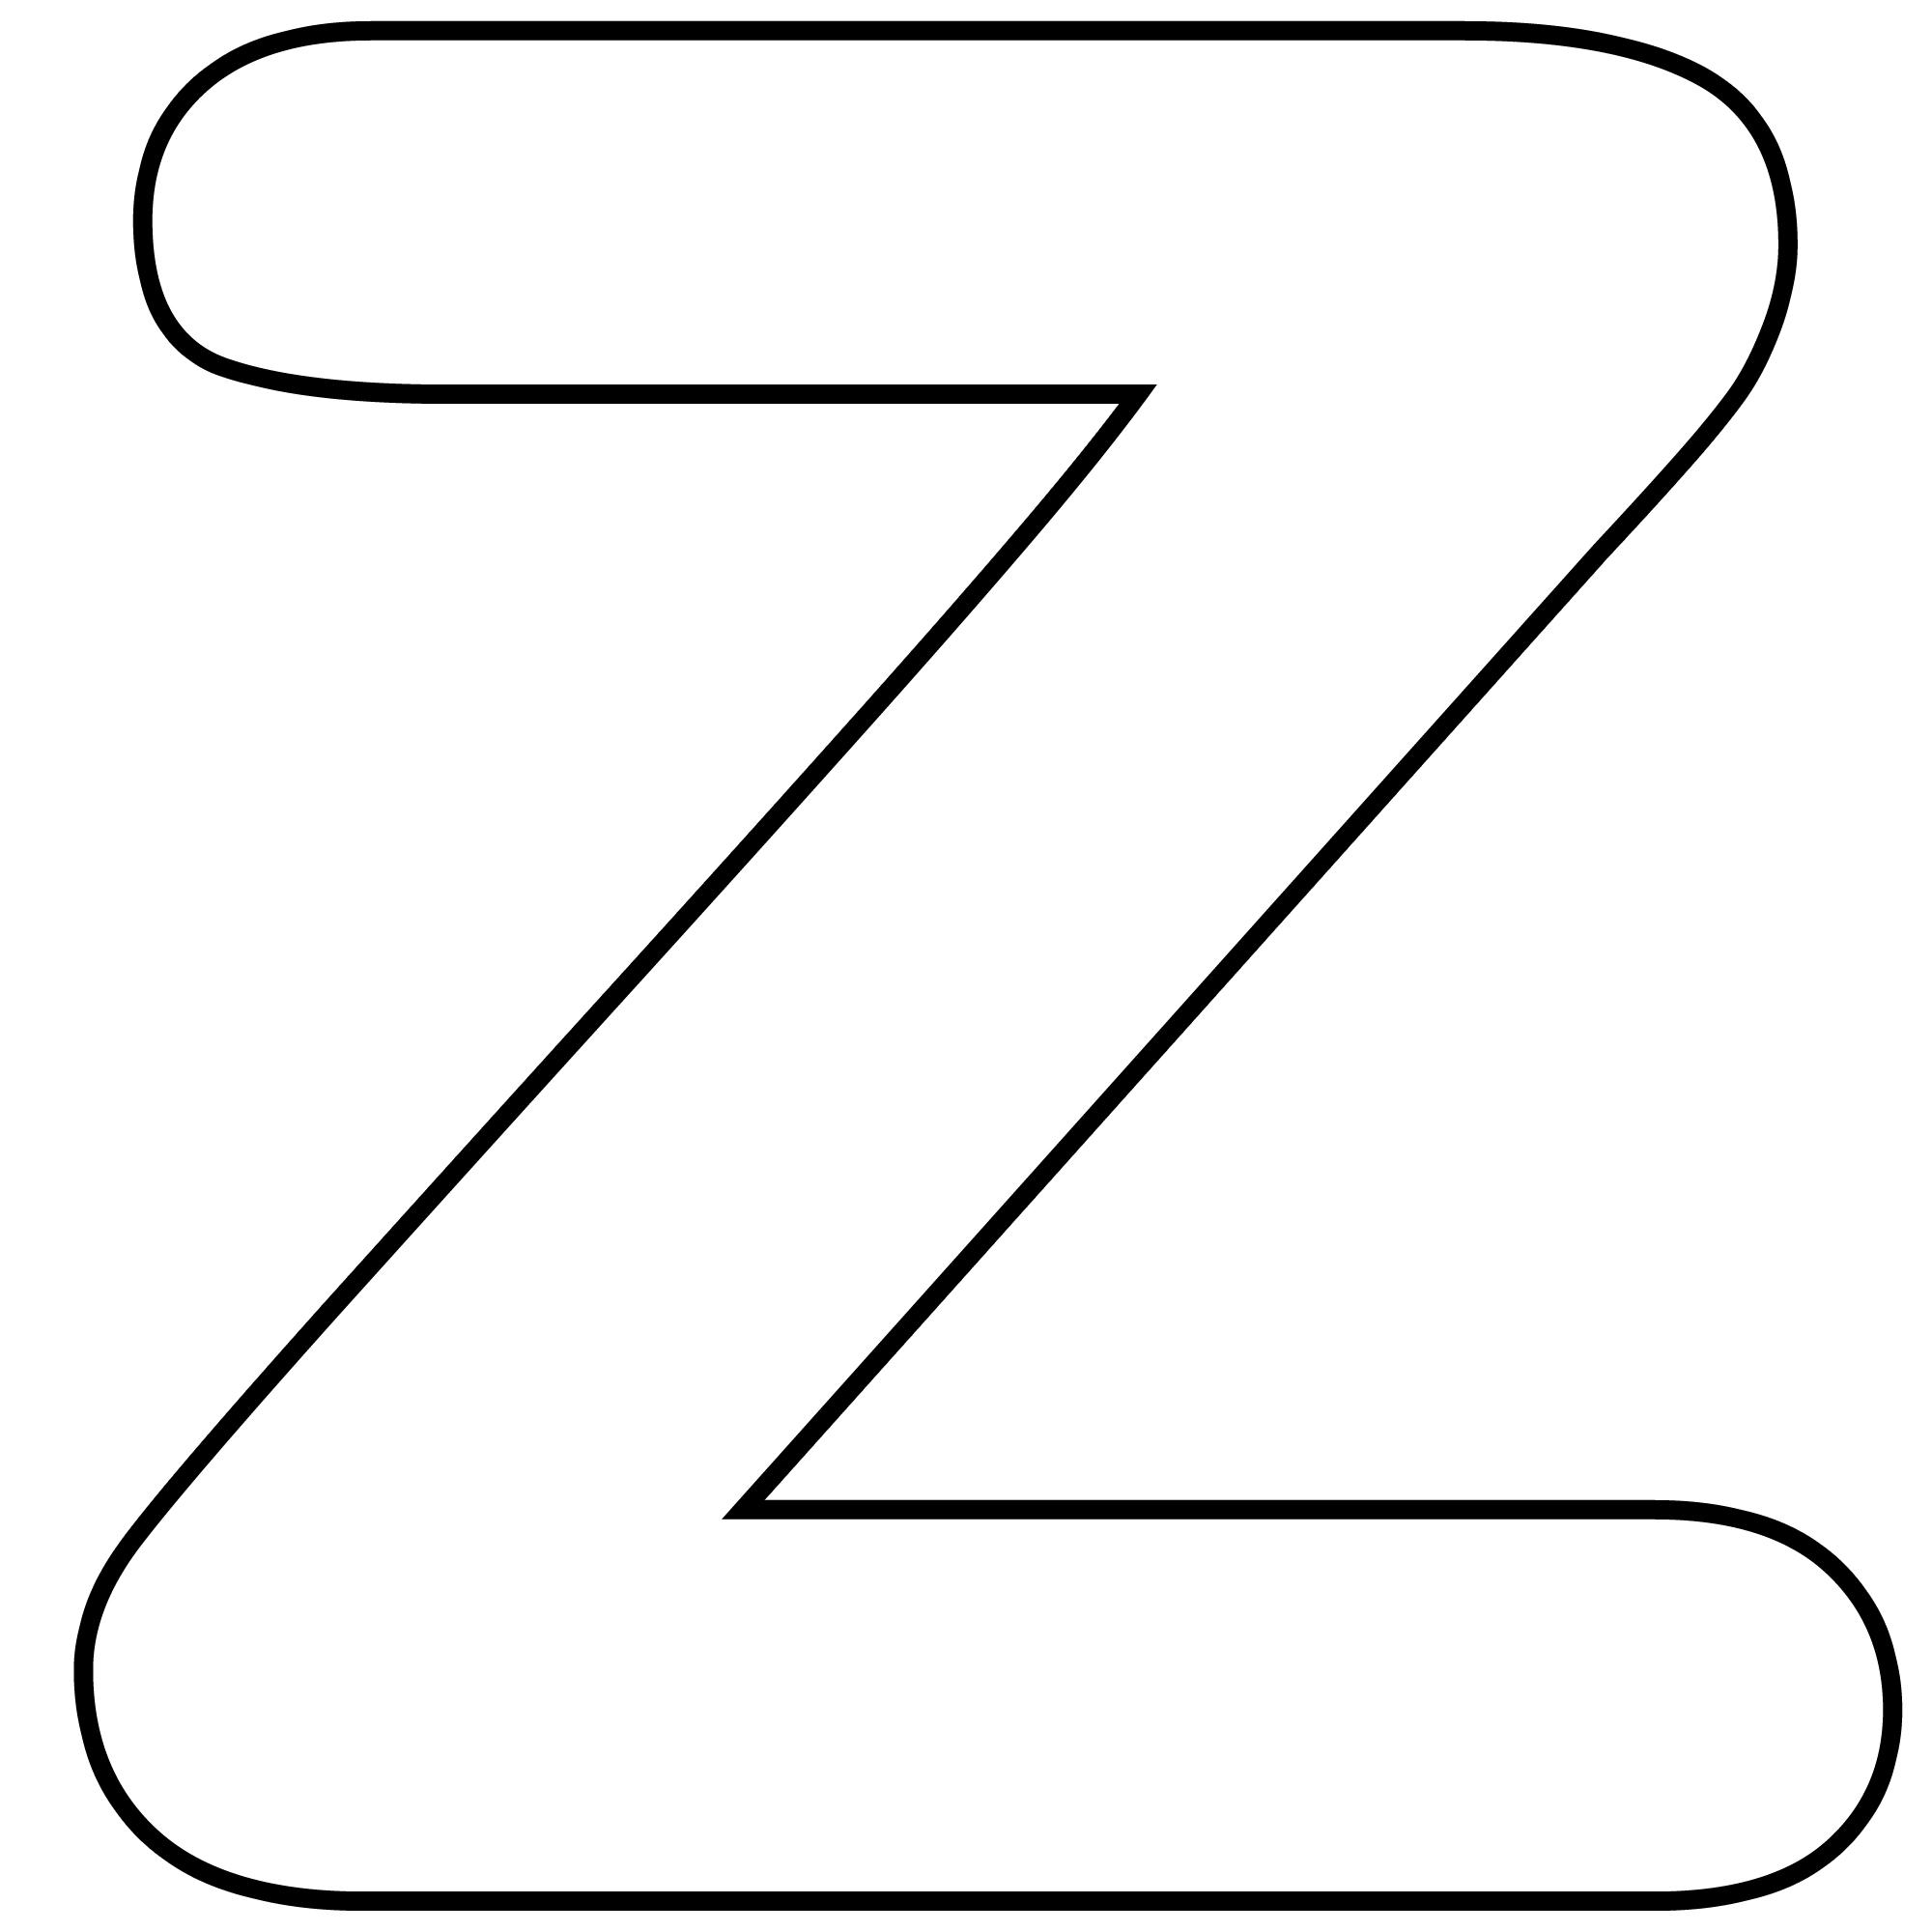 Letter Z Clipart Black And White.